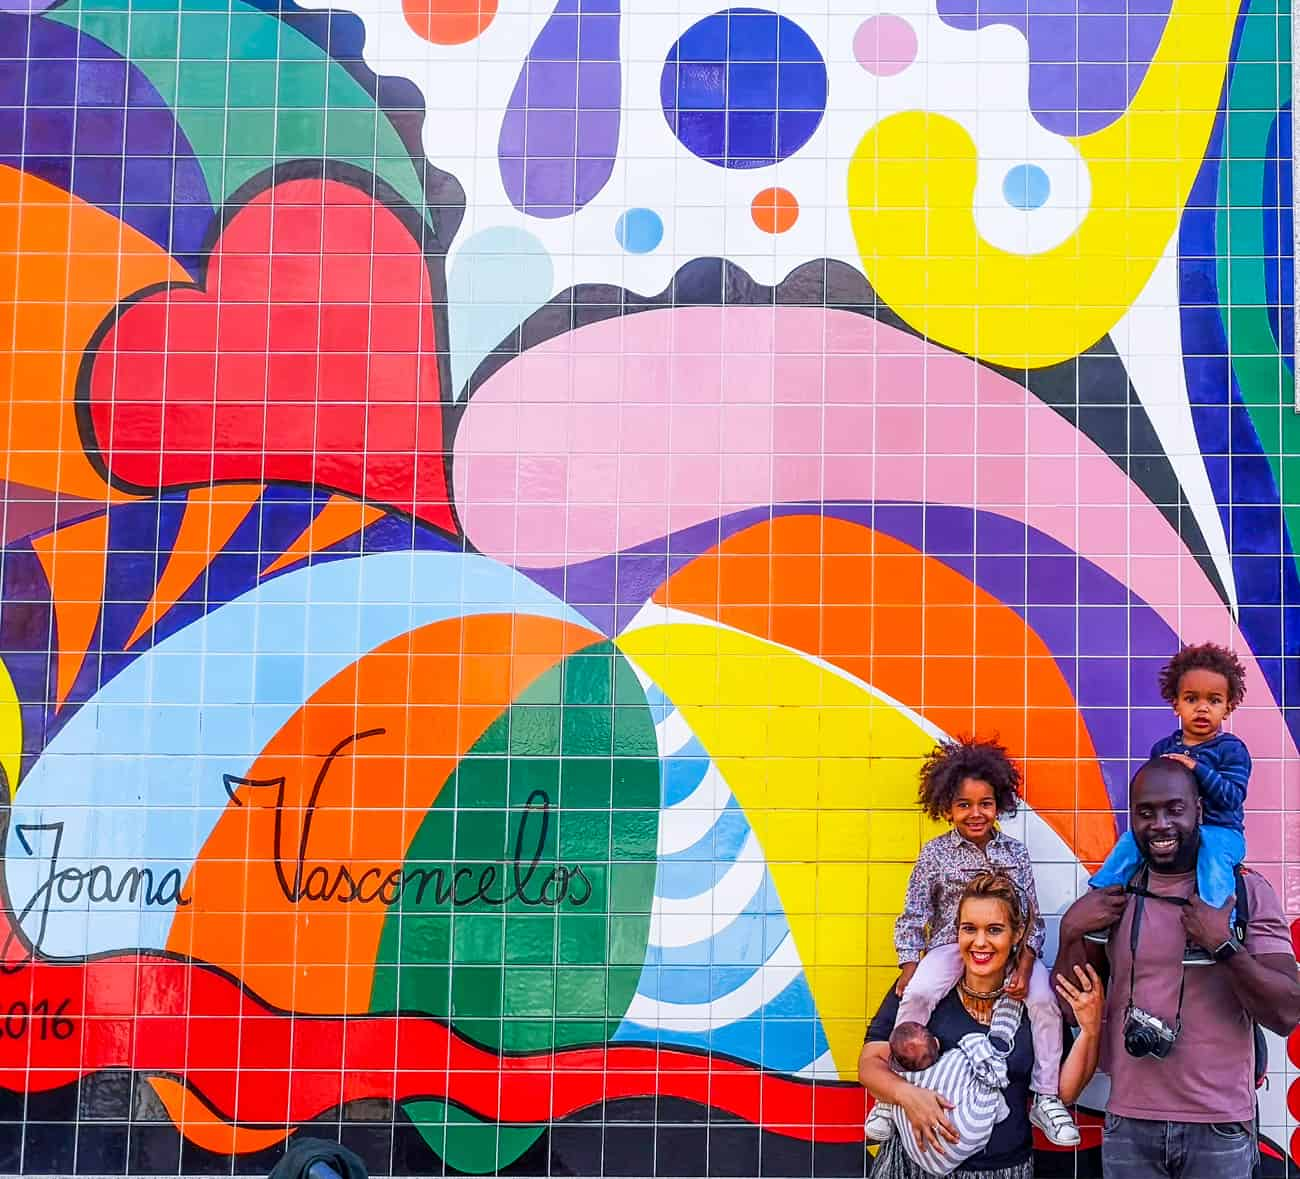 porto-visiter-city-guide